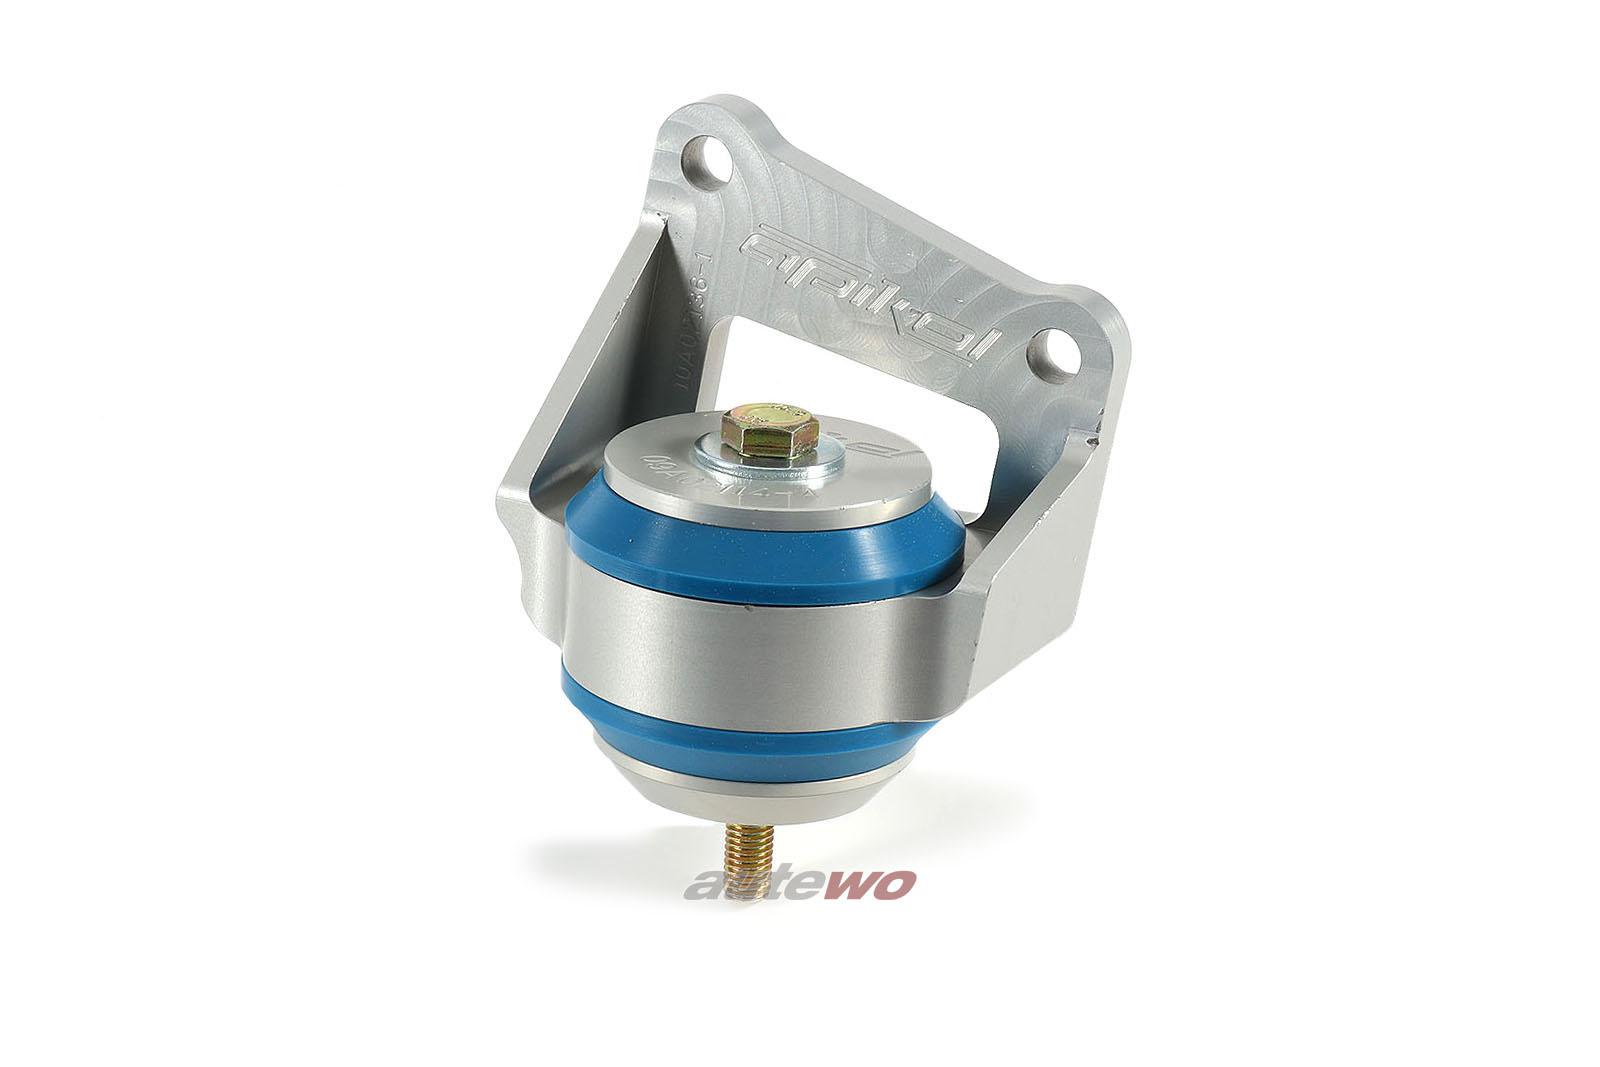 Apikol Audi 100/200 44/C4/V8 D11/S4/A6/S6+ Lager Hinterachsdifferential verstärk